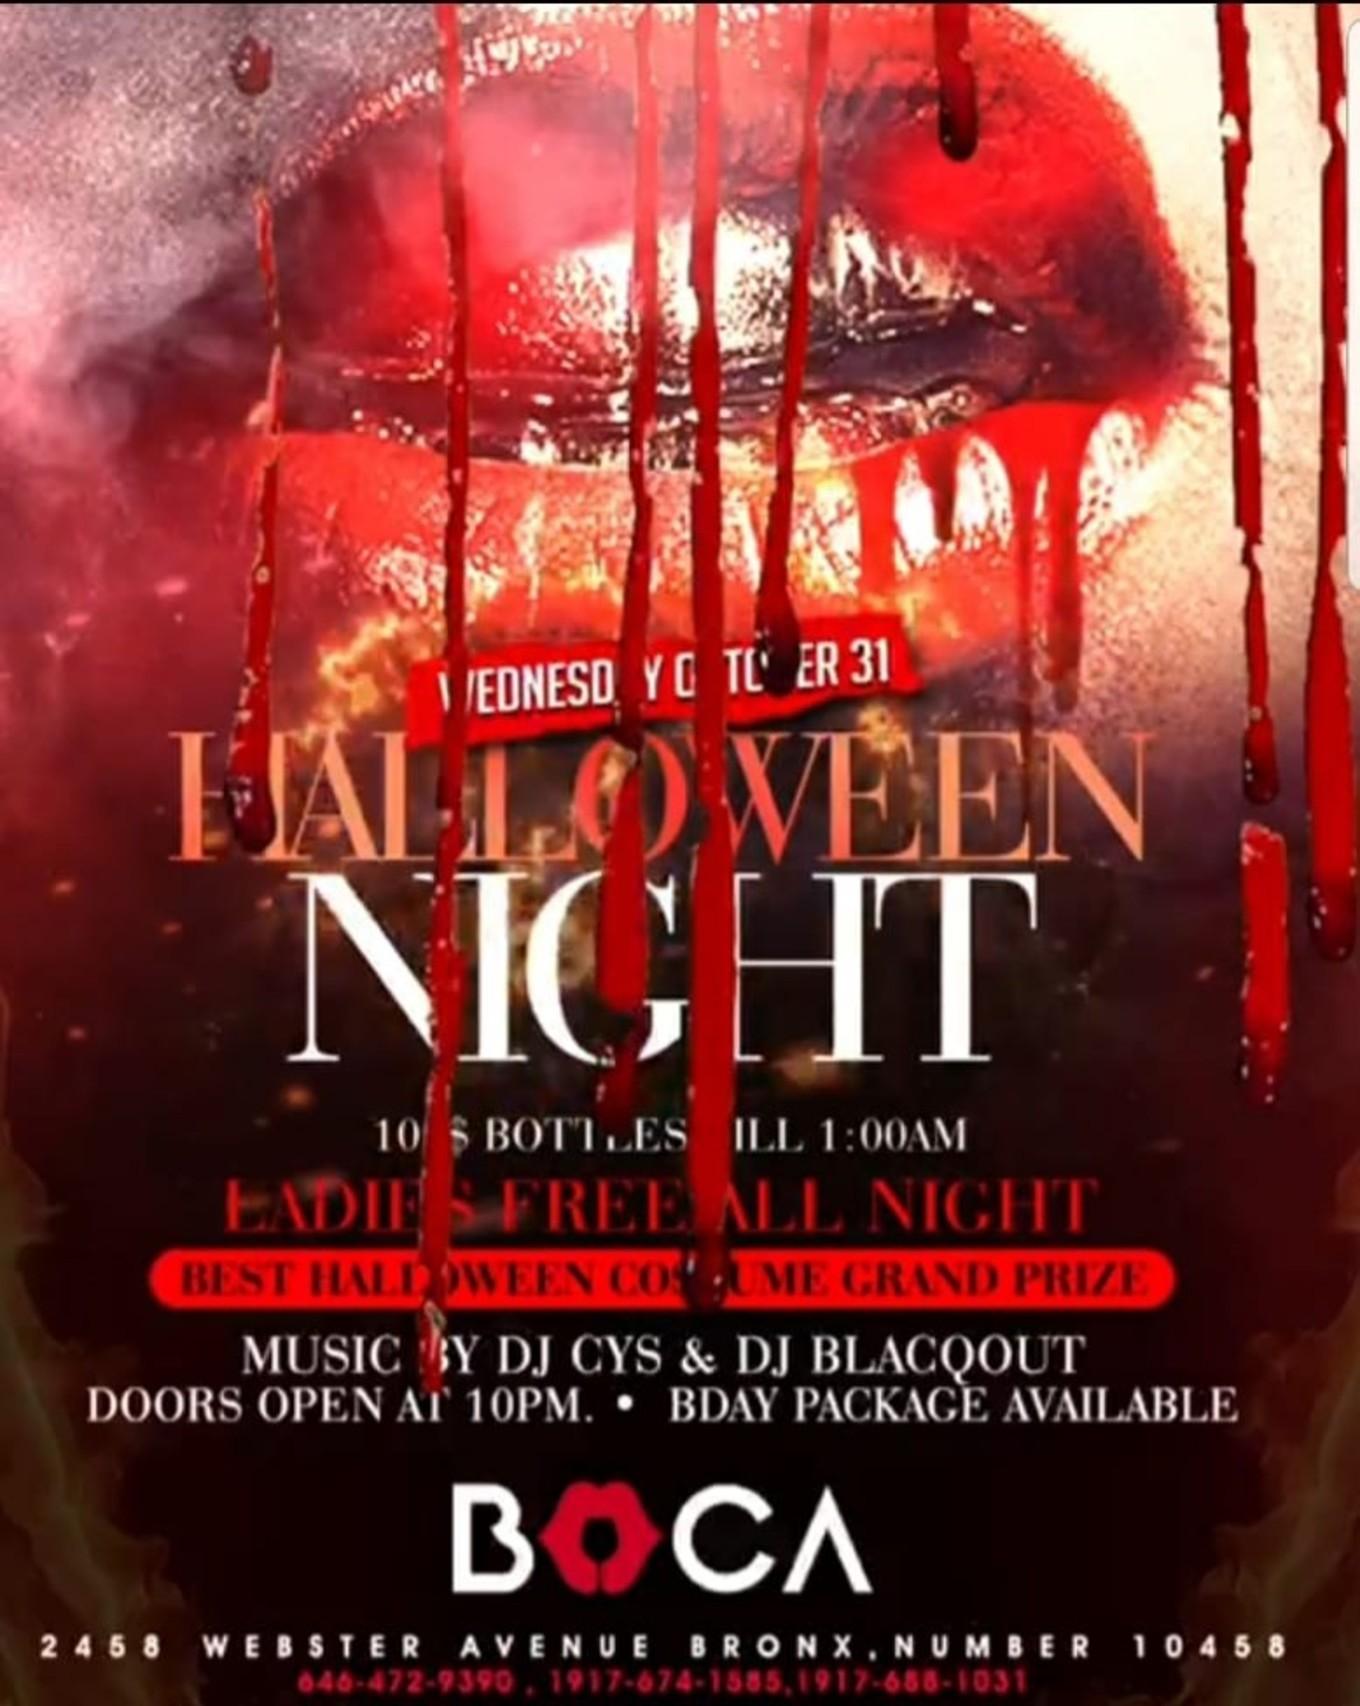 Halloween Night Party At Boca Nightclub - Tickets - Boca